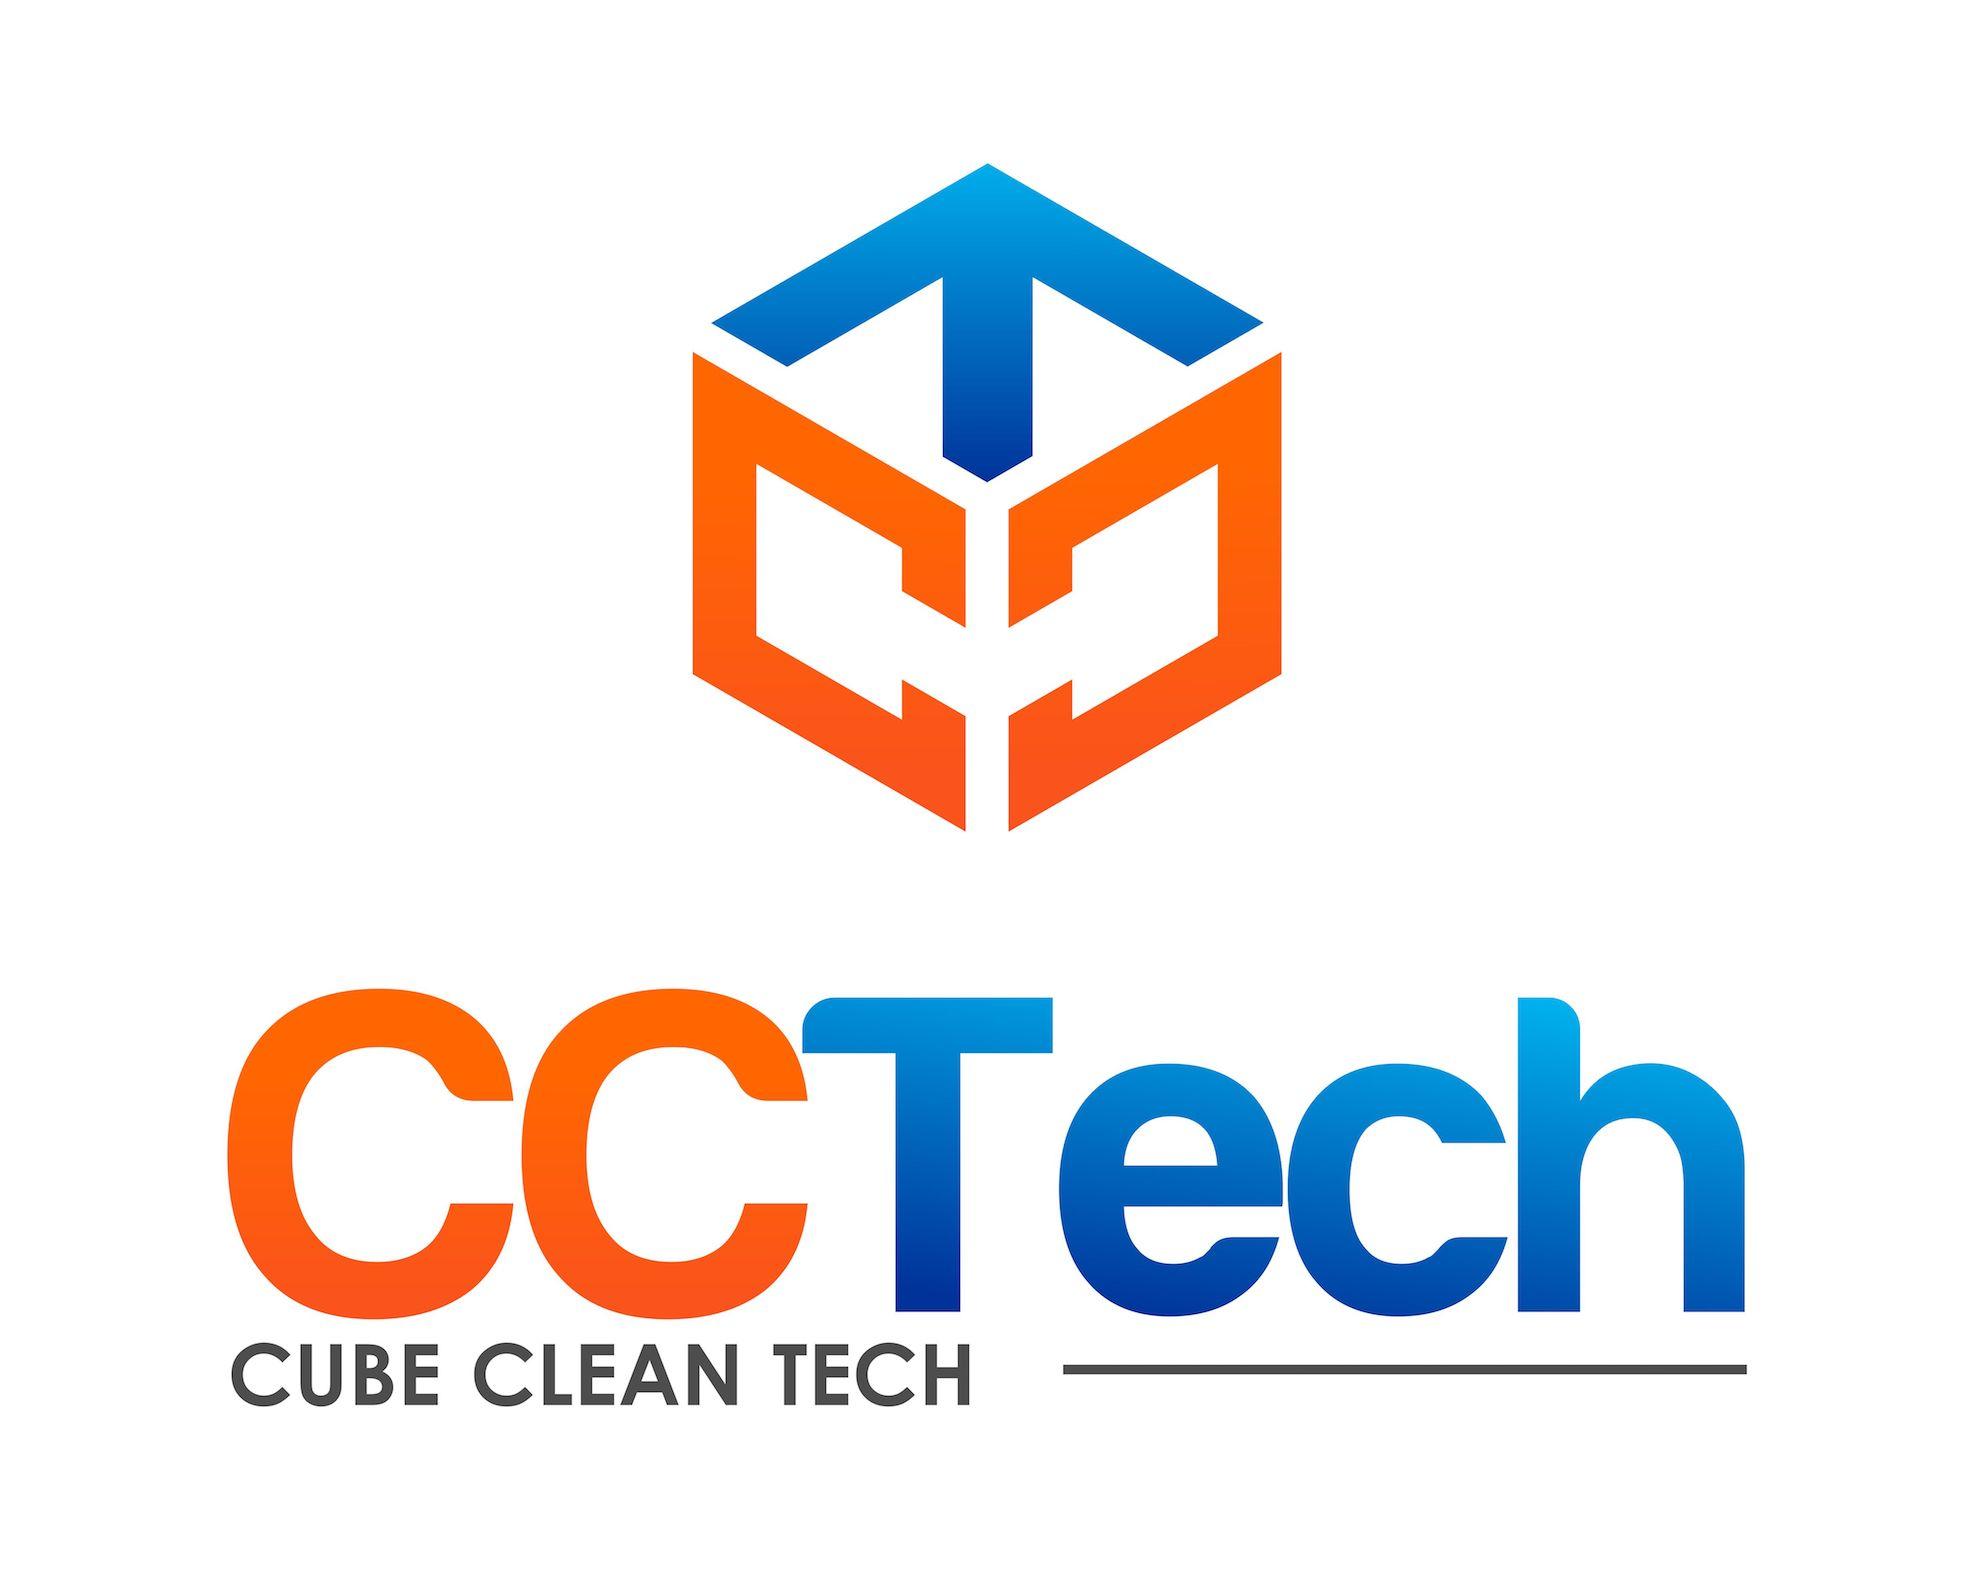 CCtech logo 1